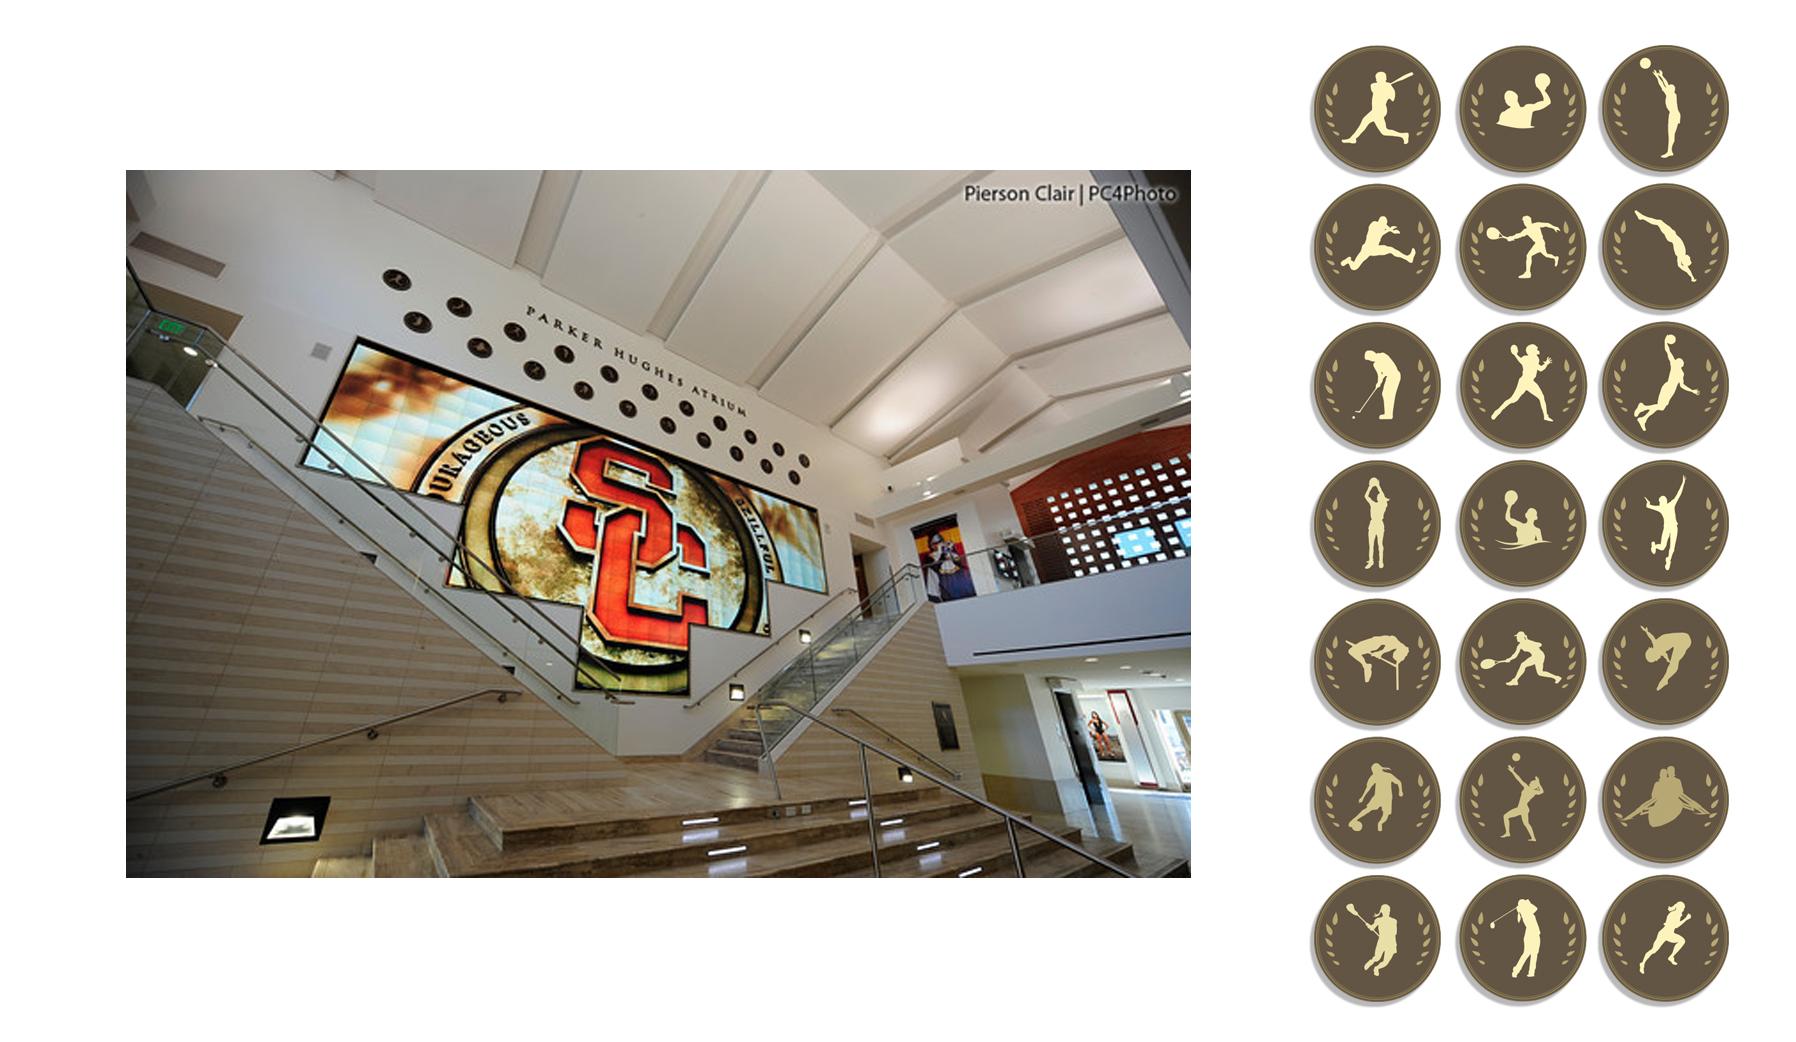 Photo by Pierson Clair | John McKay Center Installation image: Parker Hughes Atrium 21 sports medallion designs